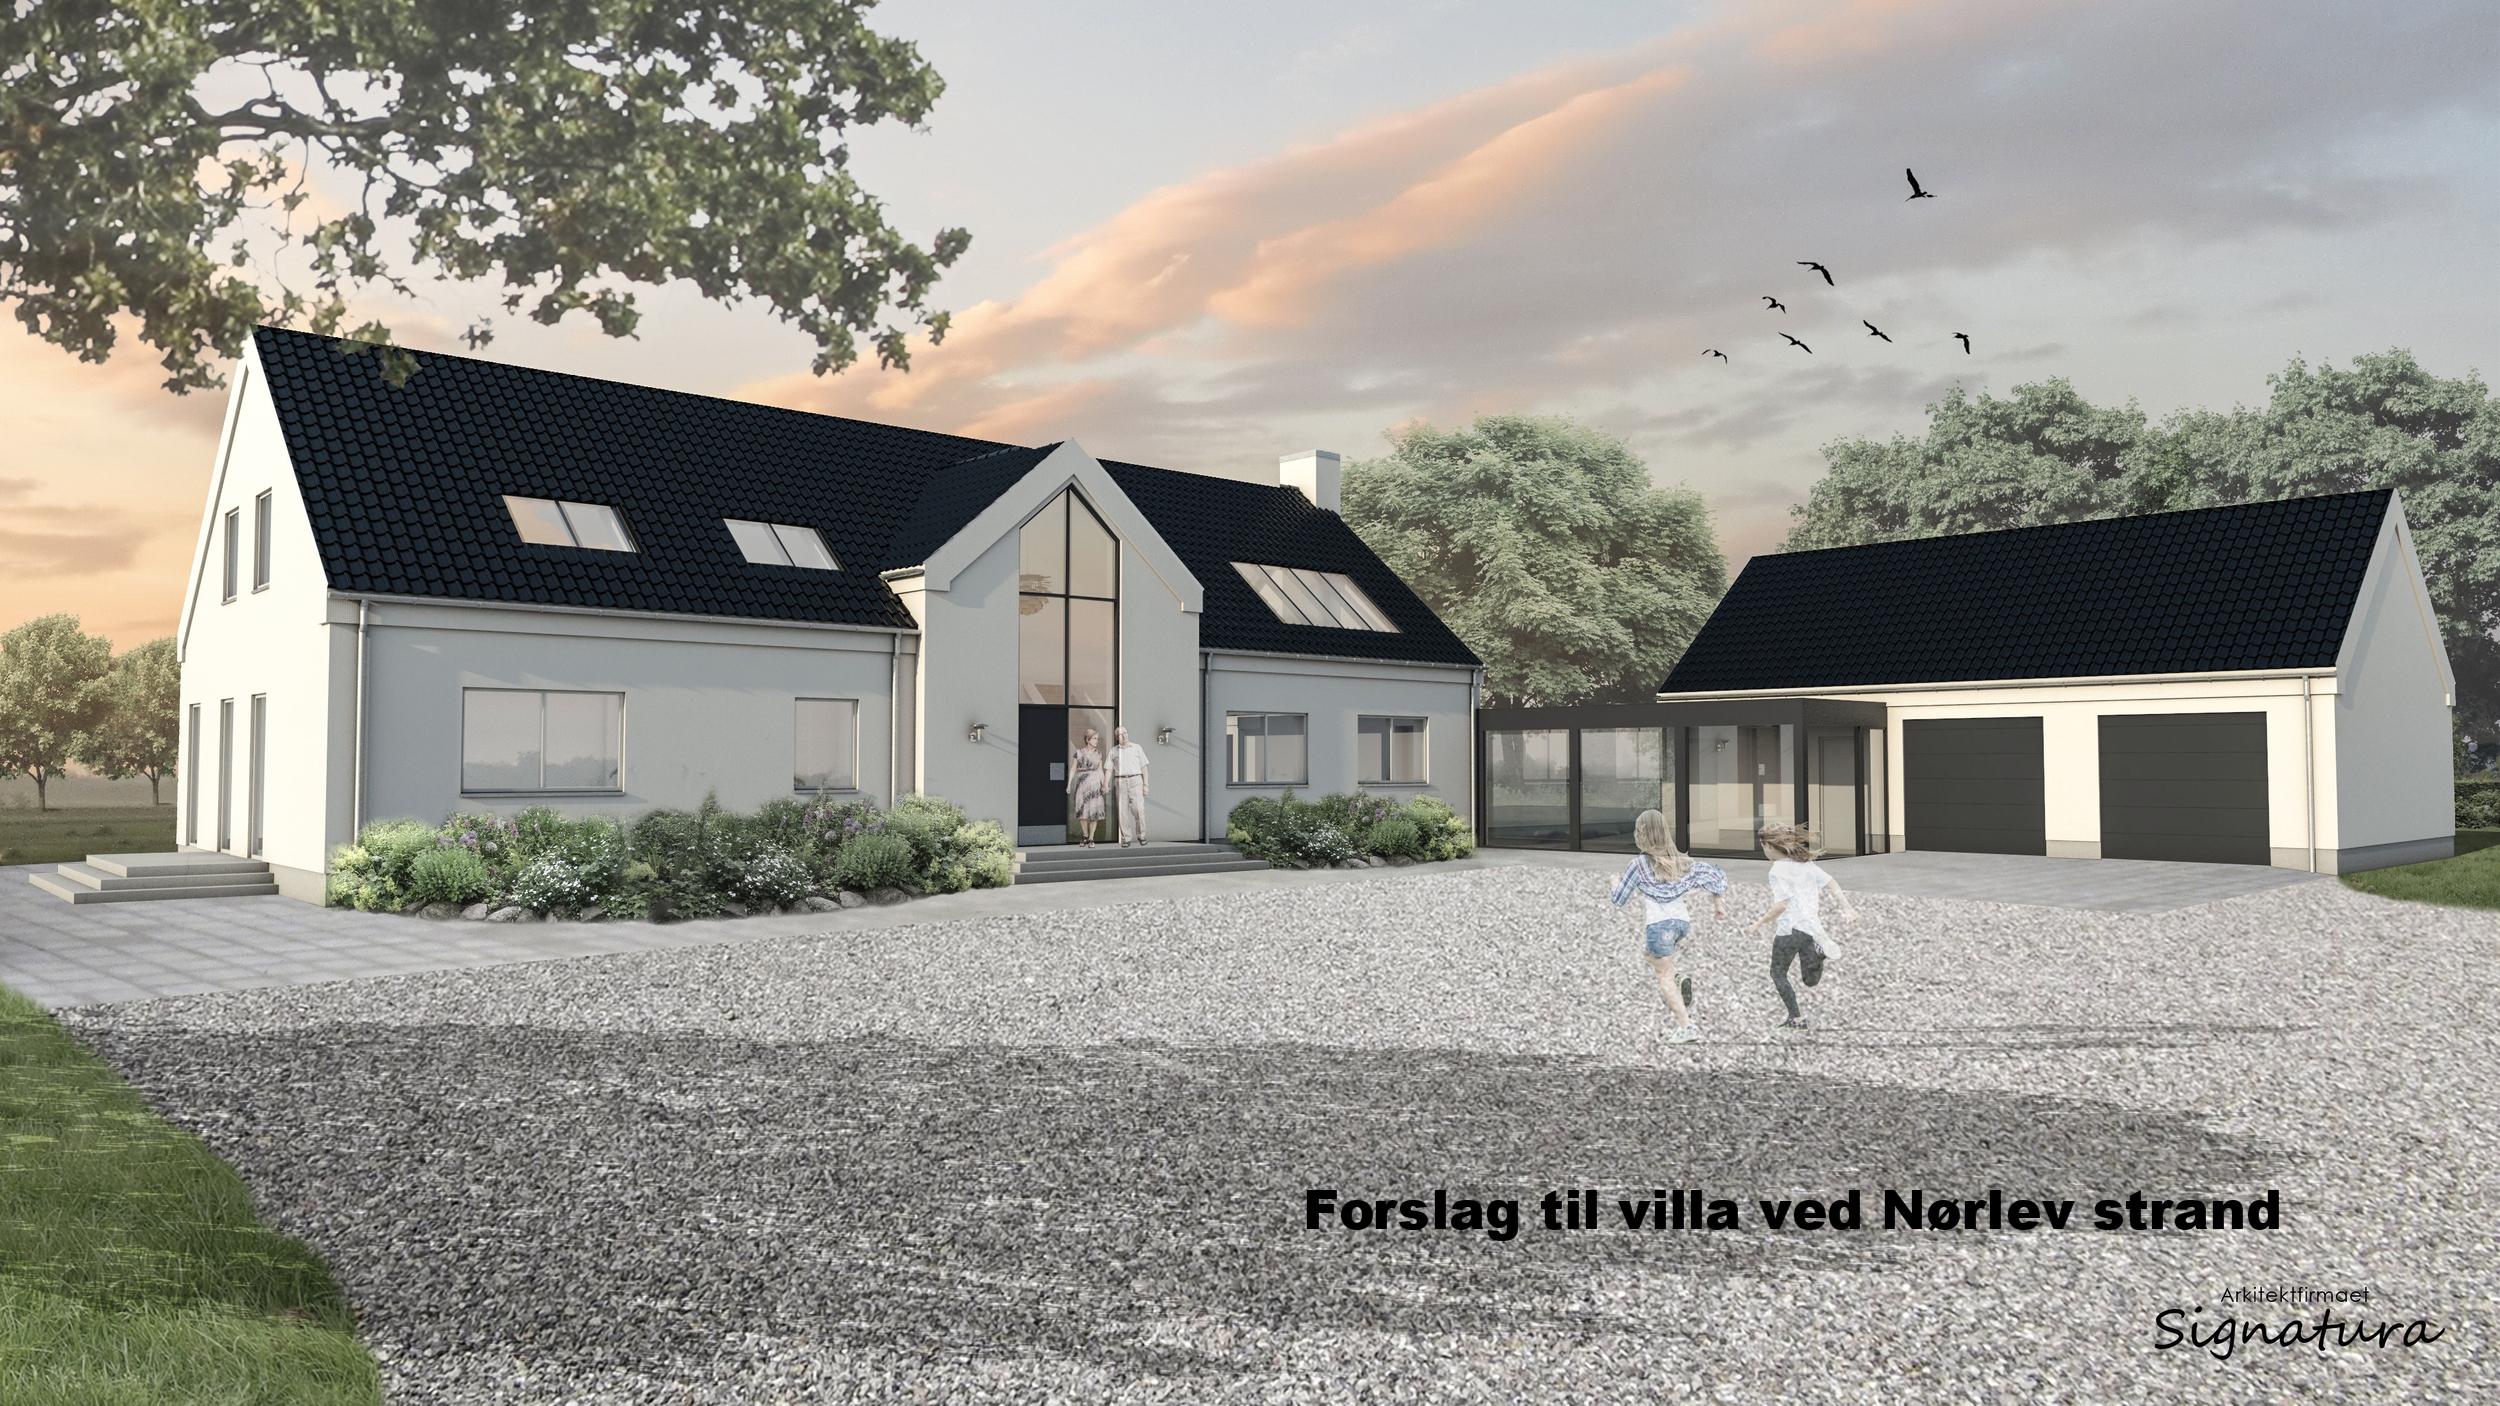 24.06.16 - Nørlev Strandvej - Visualisering.jpg